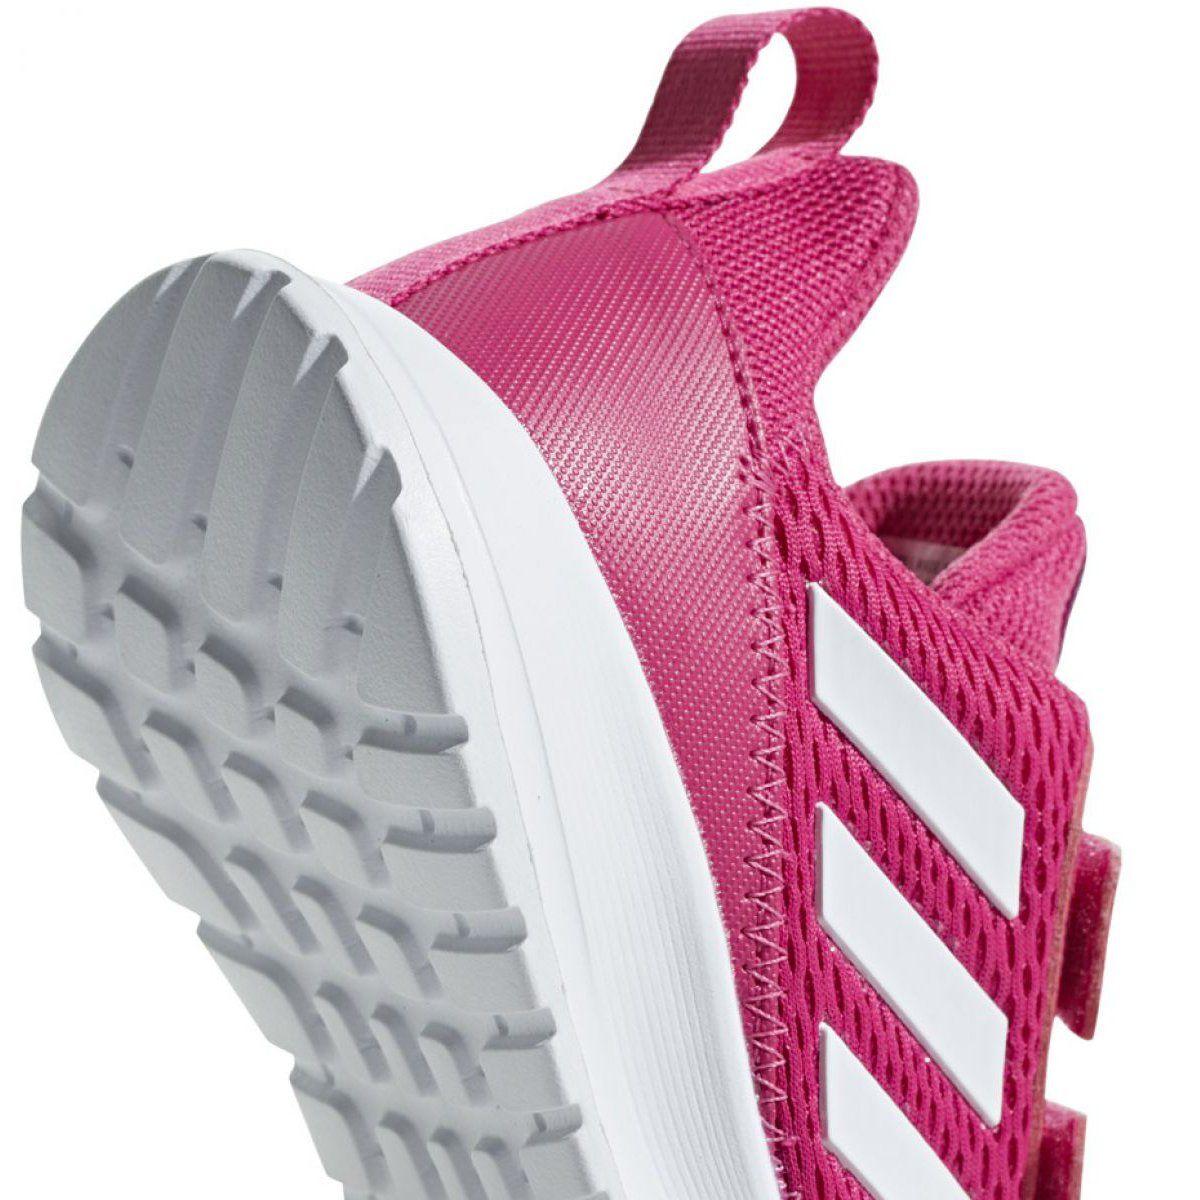 Buty Adidas Altarun Cf K Jr Cg6895 Rozowe Sports Shoes Adidas Adidas Shoes